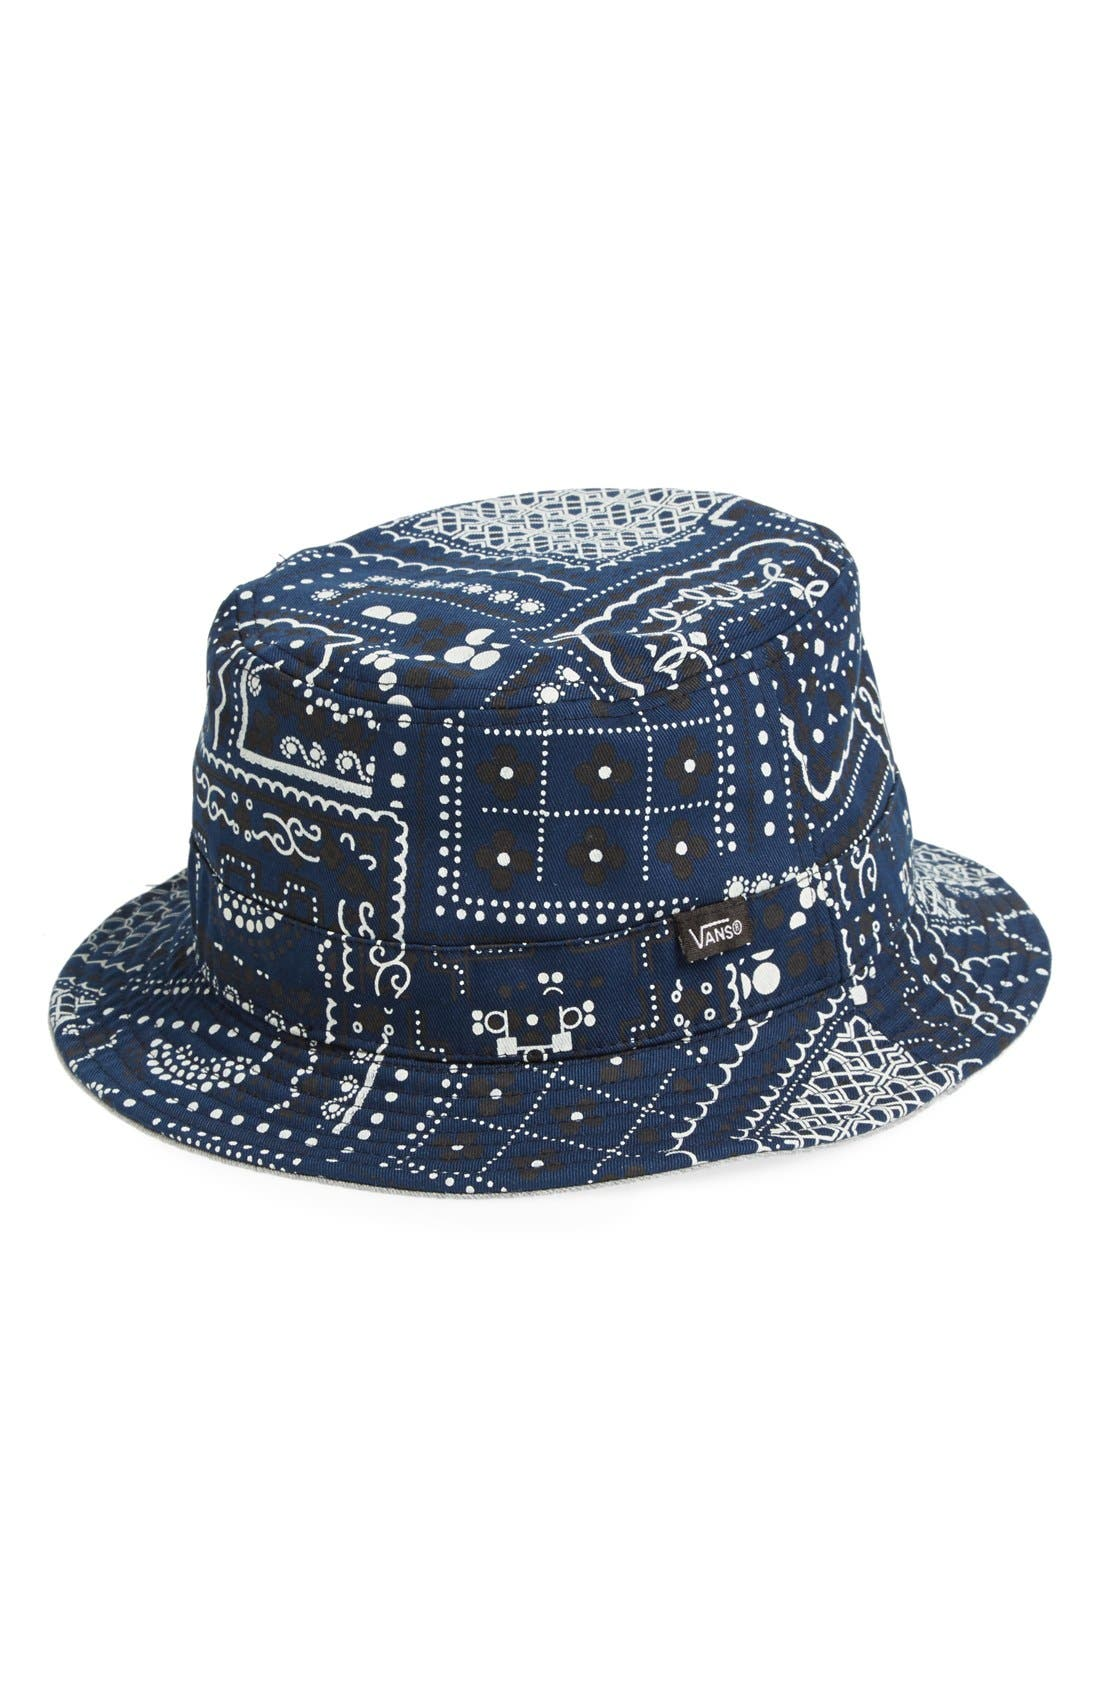 'Vandana' Bucket Hat,                             Main thumbnail 1, color,                             410